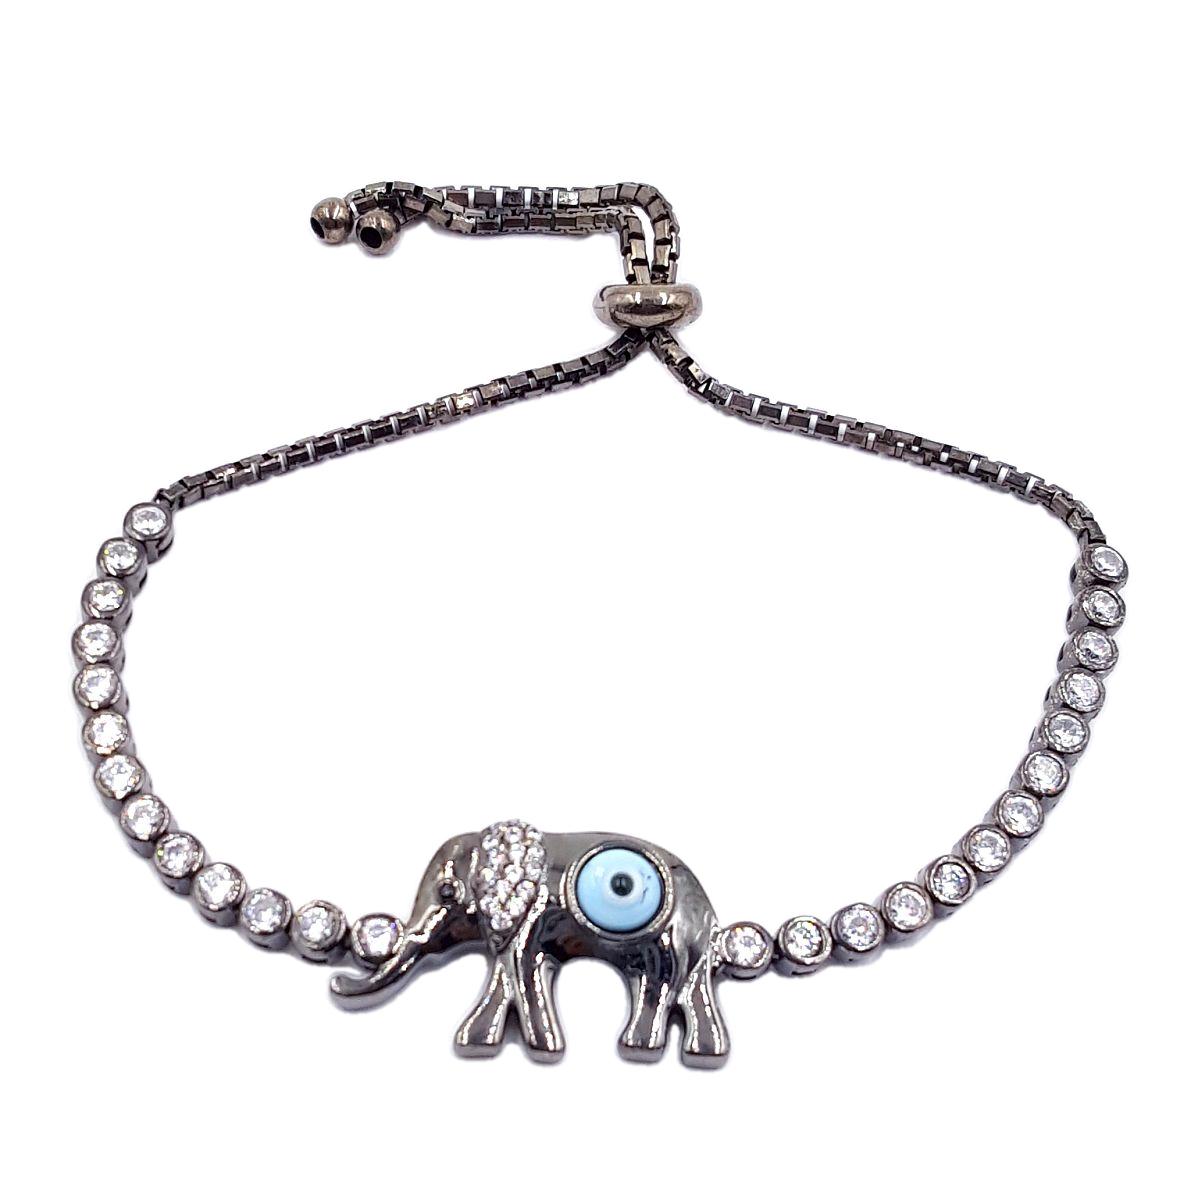 3920e48e604d3 Evil Eye High Quality 925 Sterling Silver Black Elephant Bracelet ...